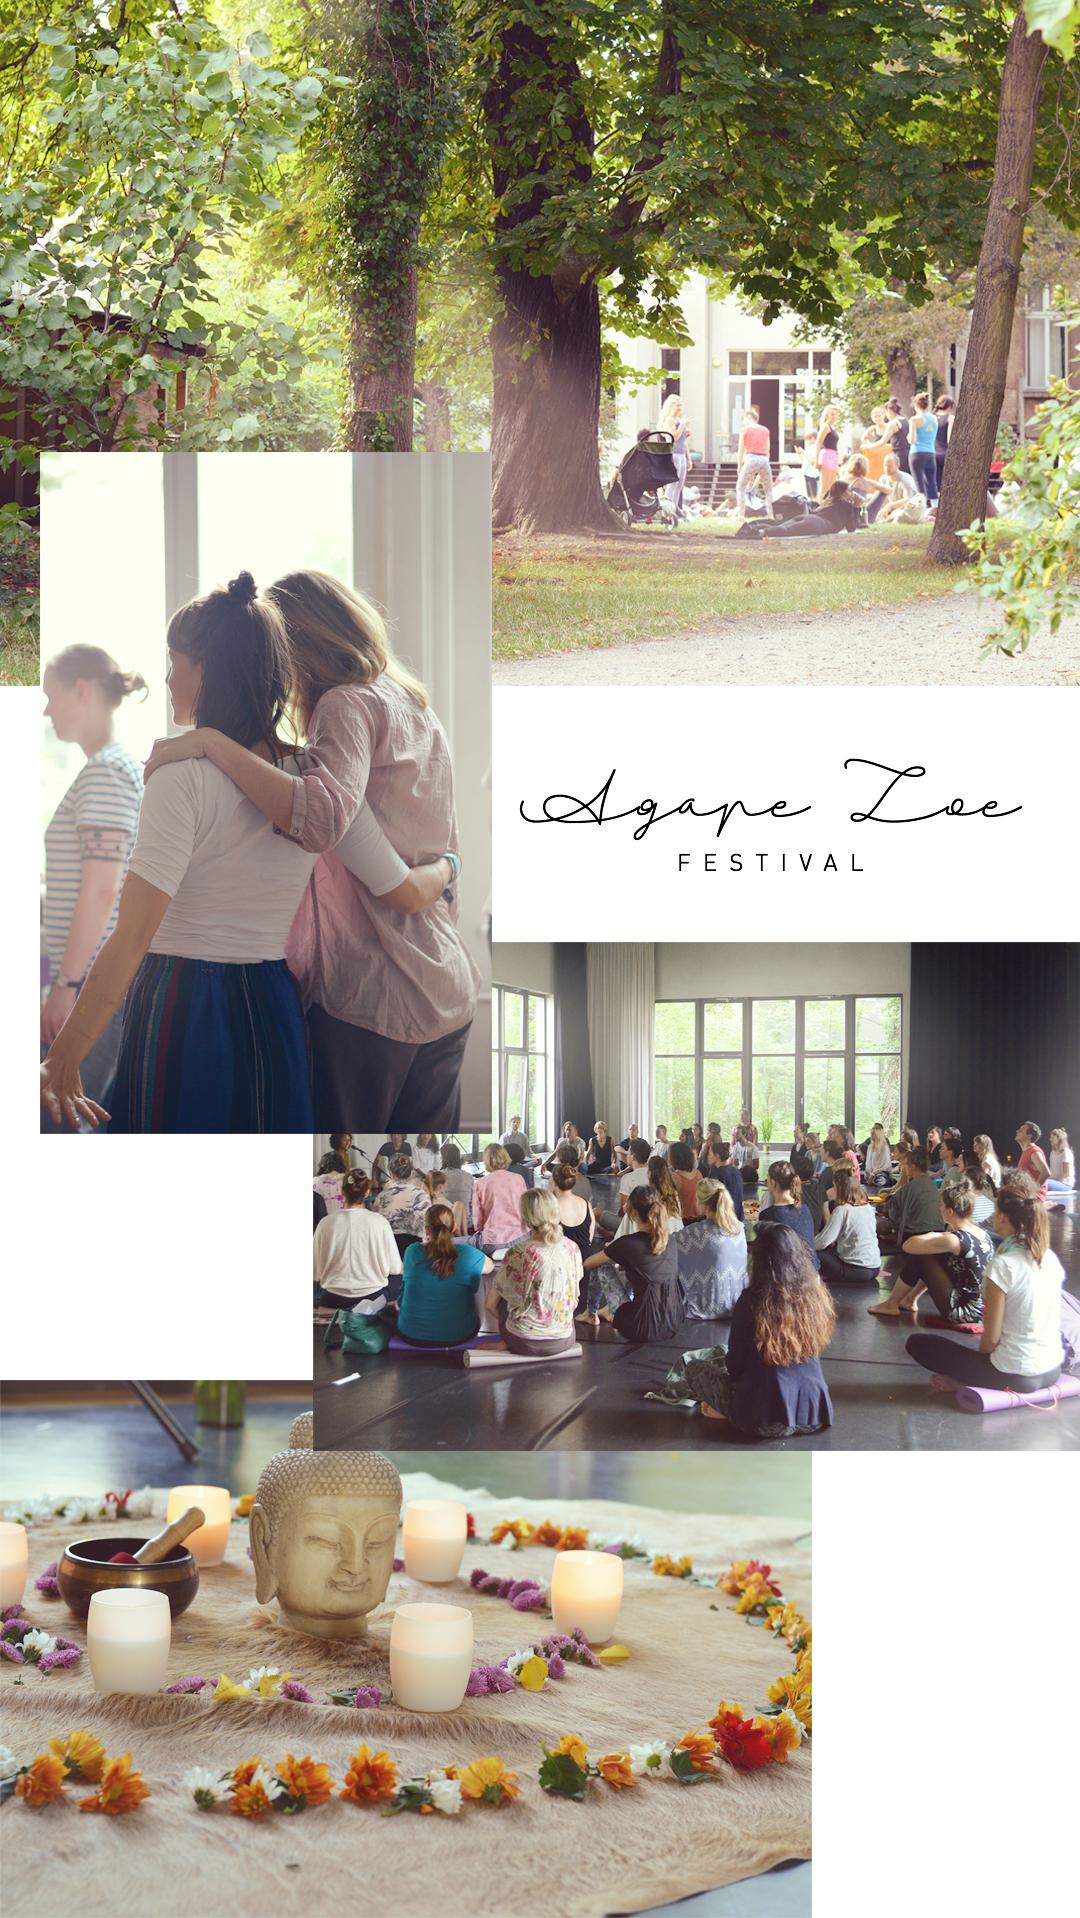 Agape Zoe Festival Berlin Pankow Tanzstudio Eden Yoga Healing Arts Mindfulness Recap Tränen Transformation